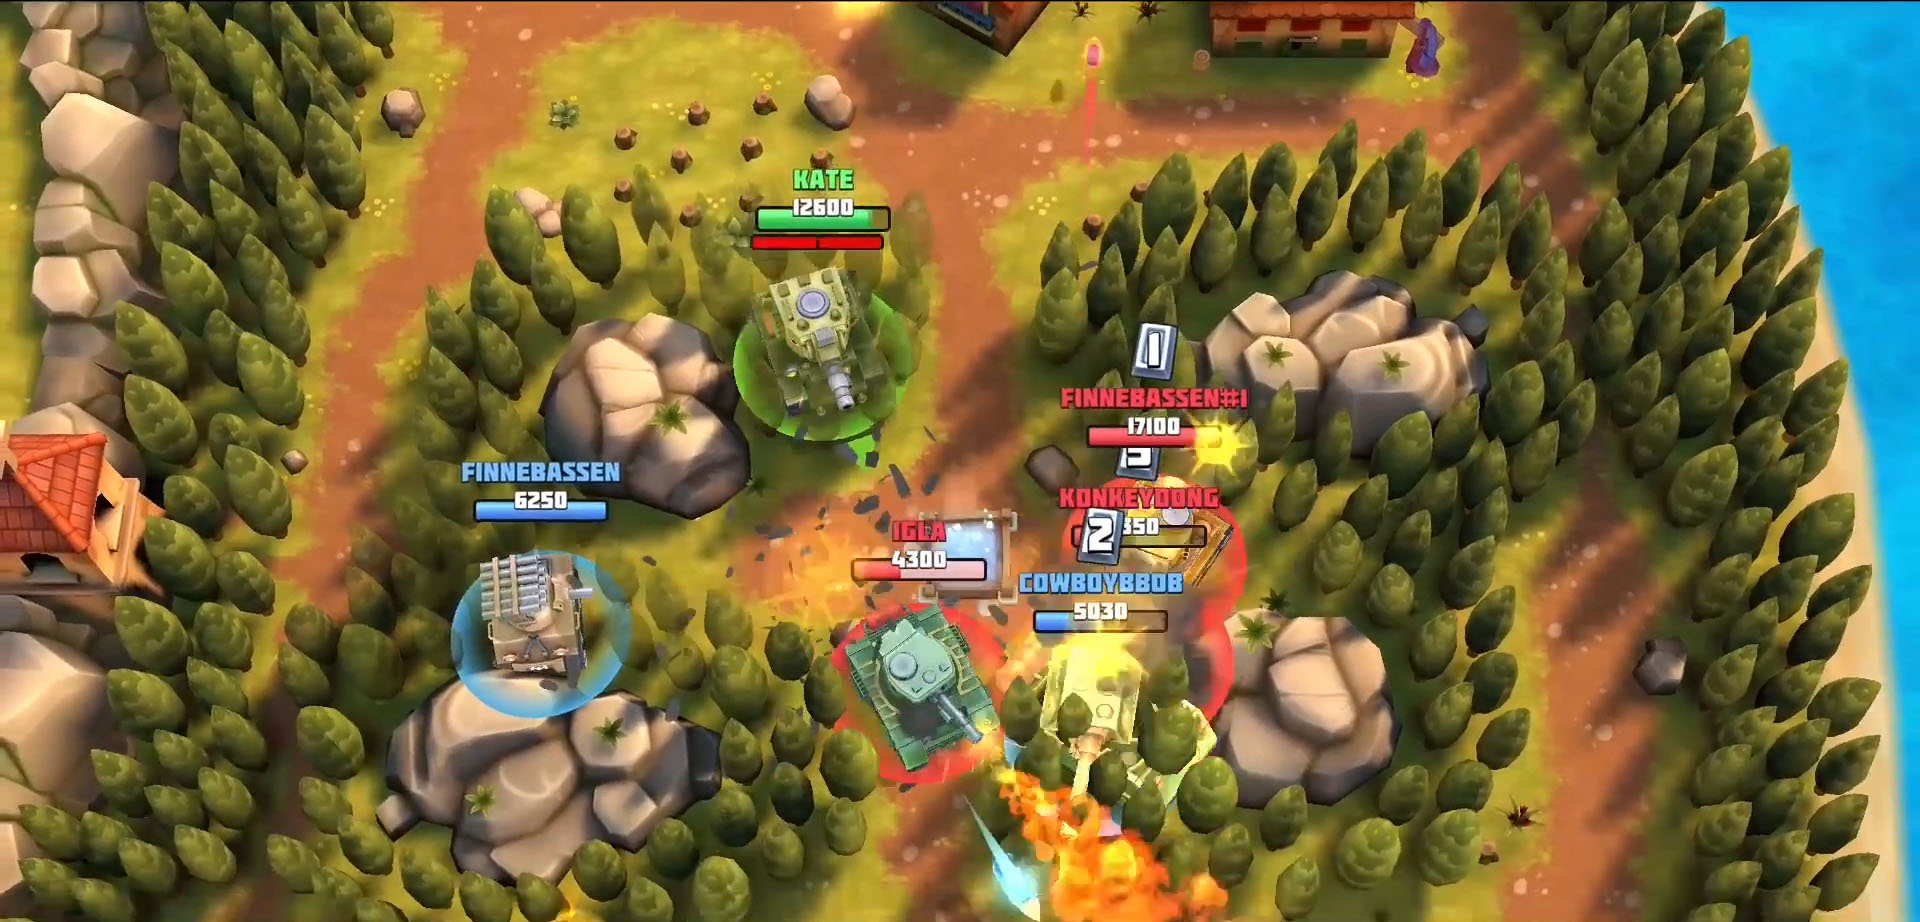 Tanks Brawl : Fun PvP Battles! screenshot 1